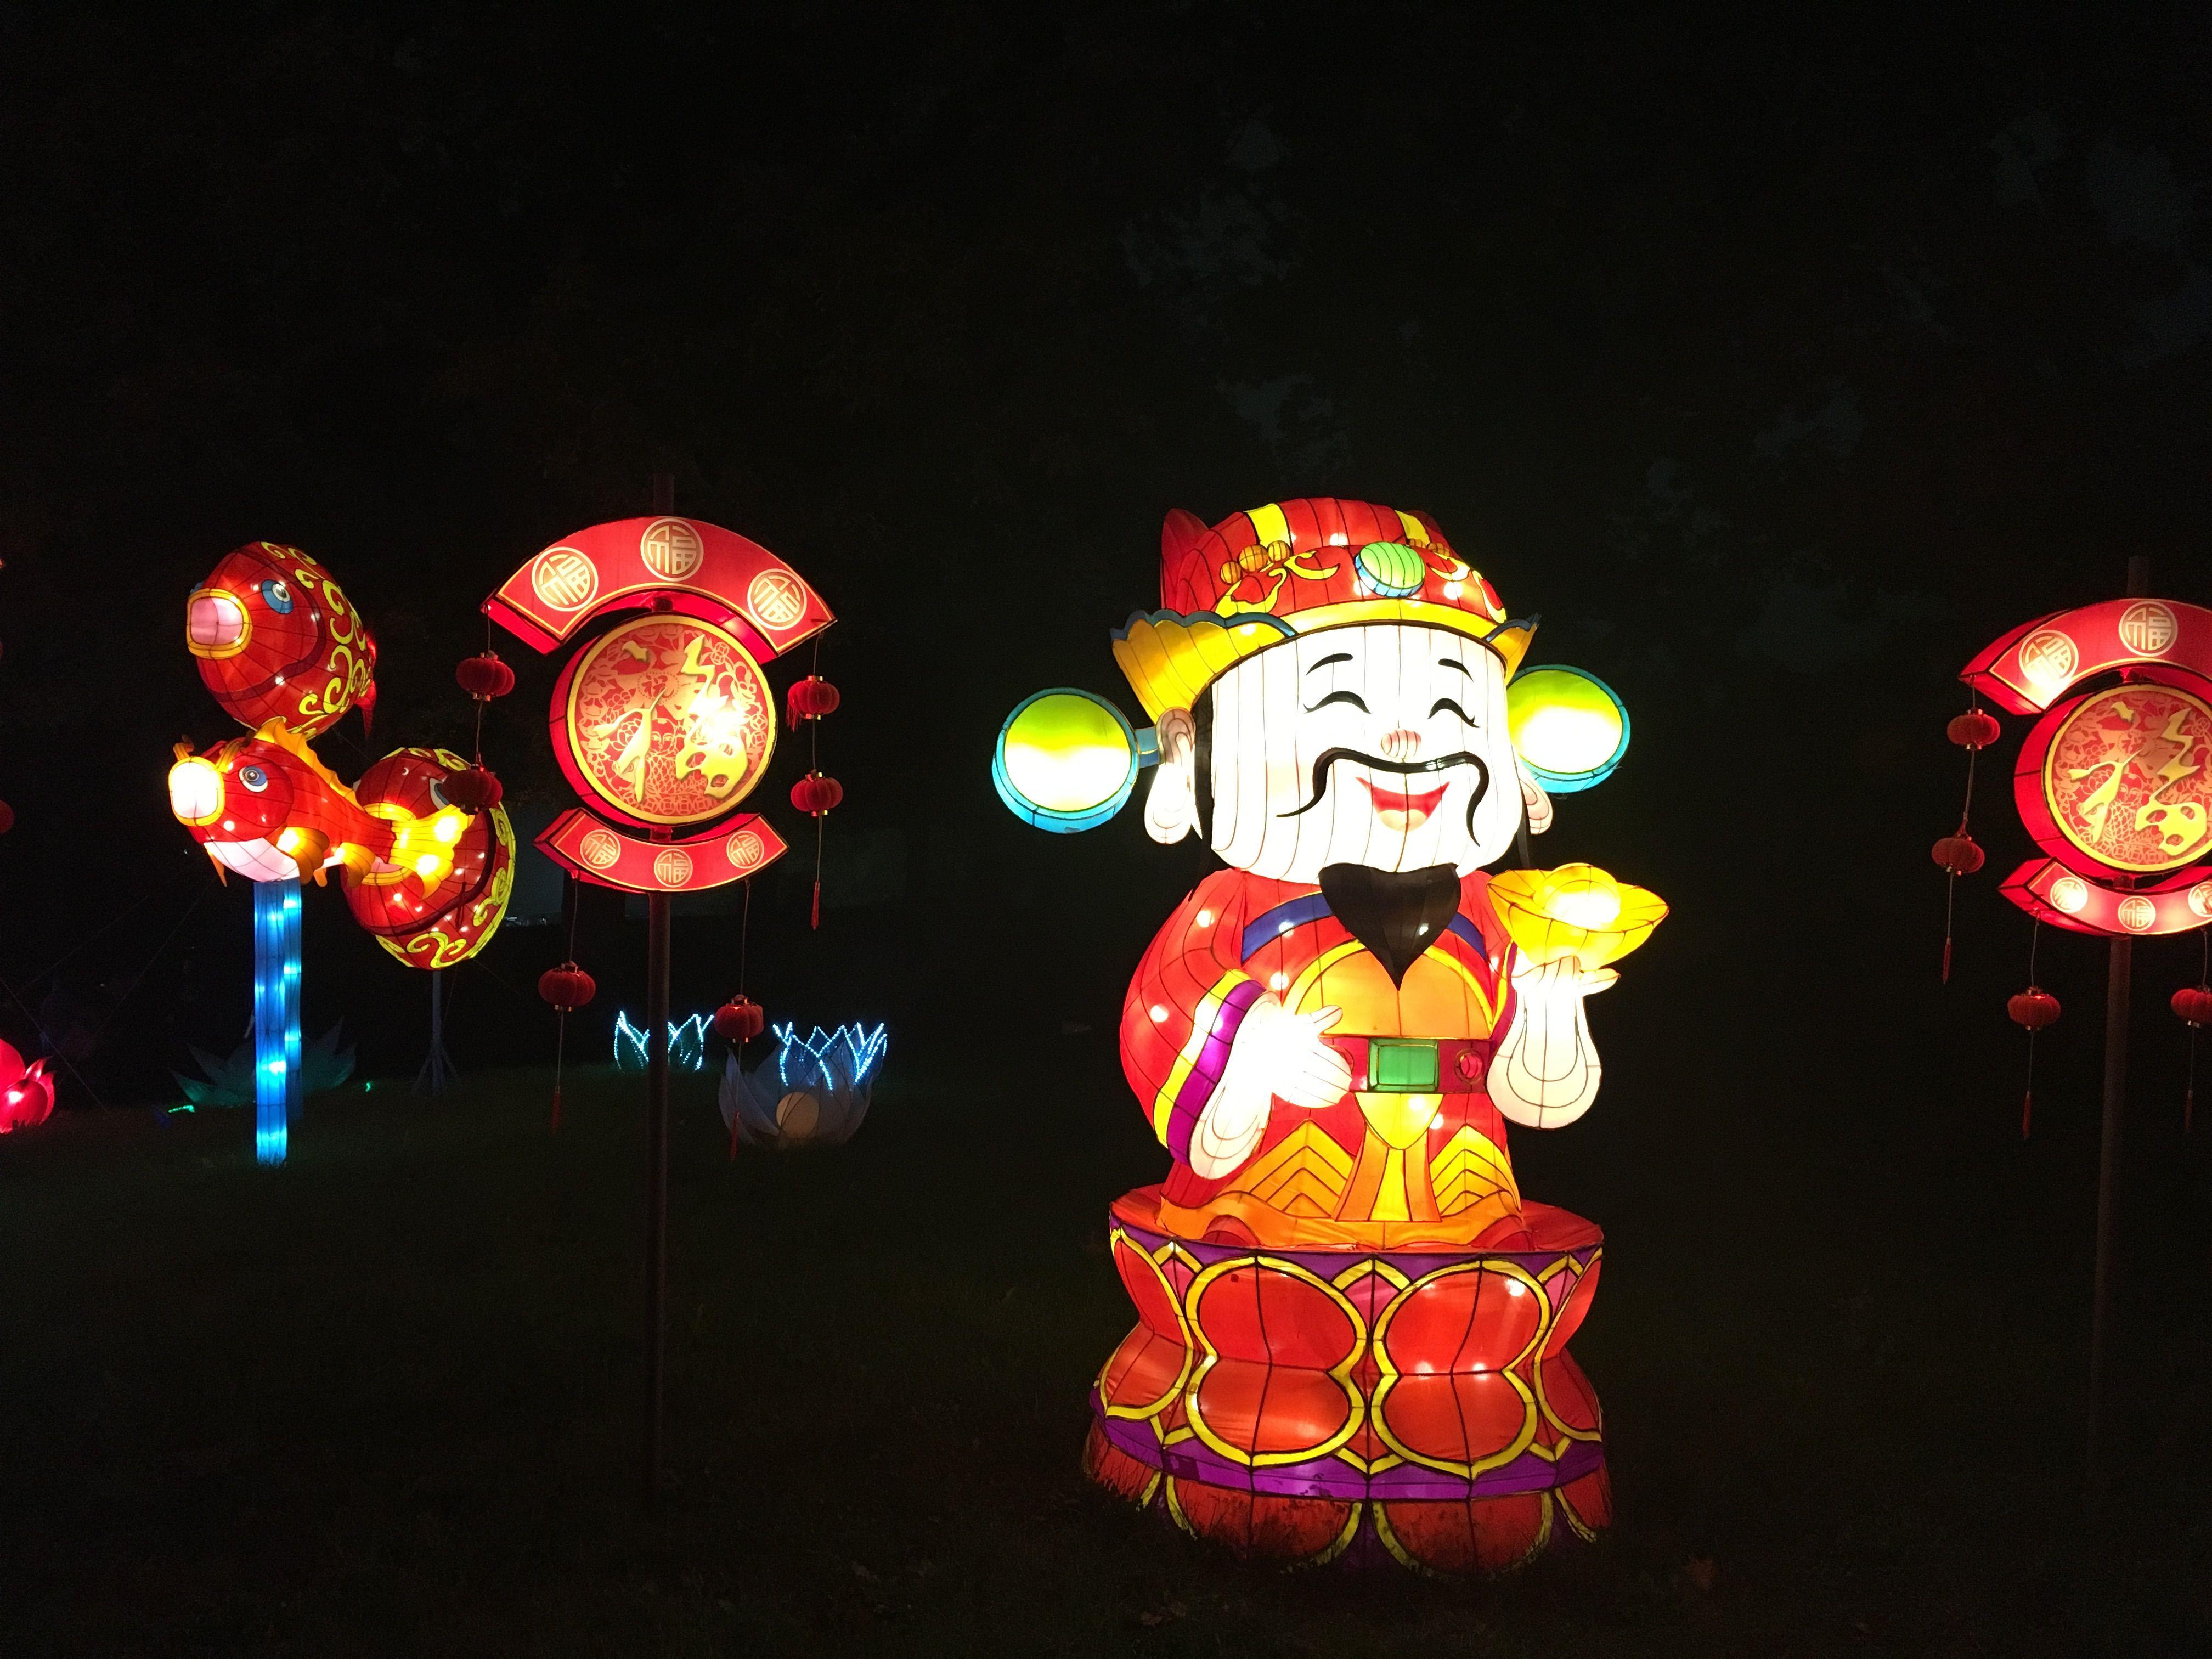 797affacd7e512fafa6798b58b5eba9c - China Lights Boerner Botanical Gardens Tickets